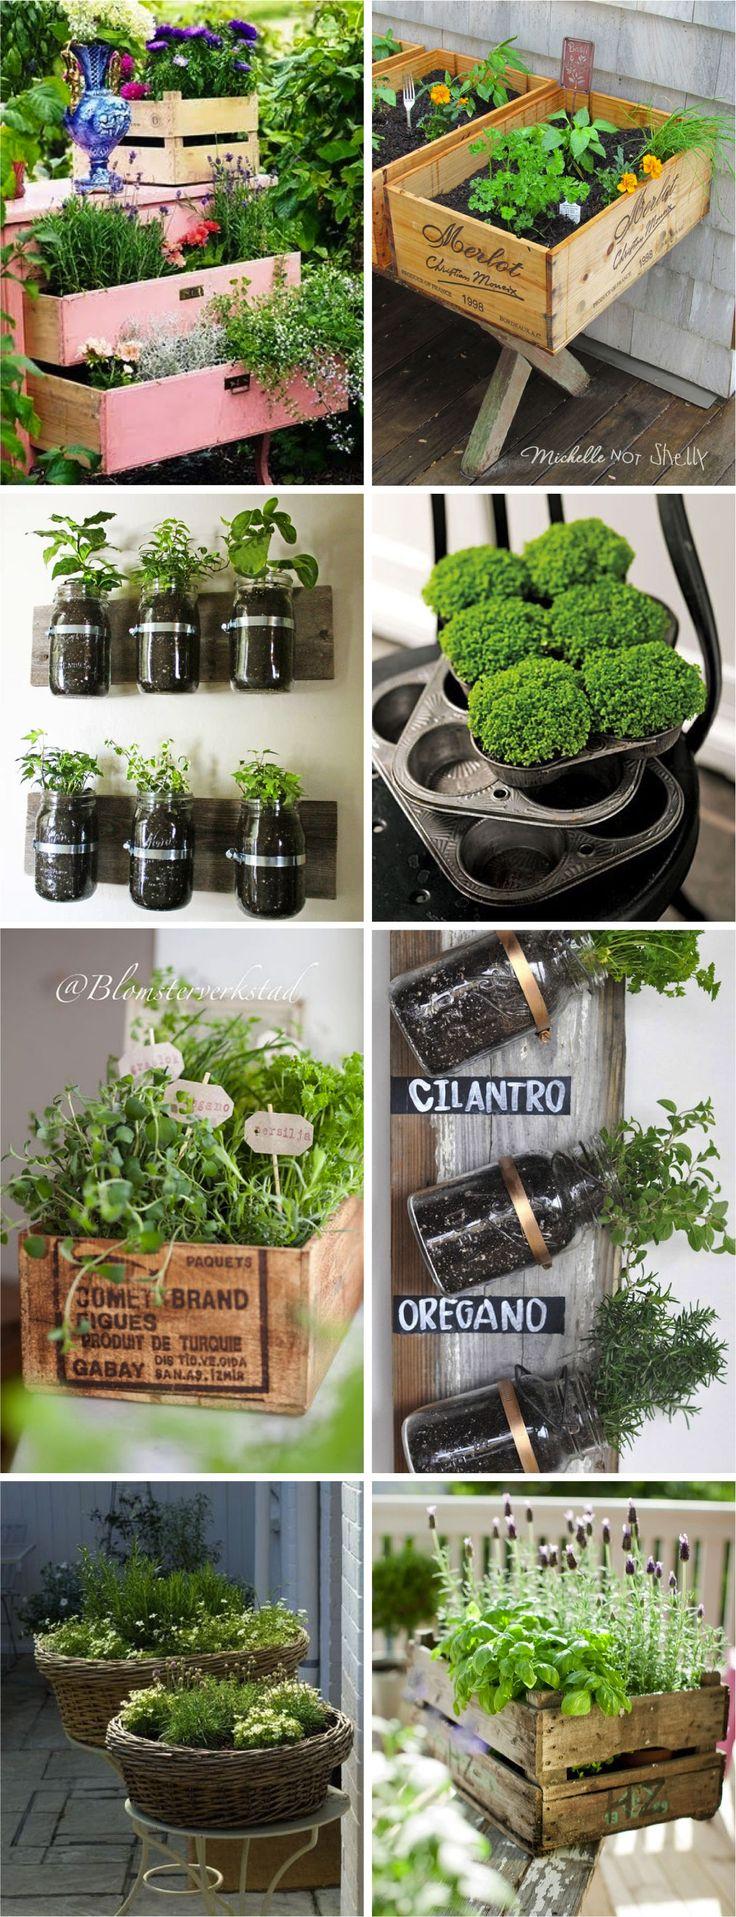 Ideias para horta